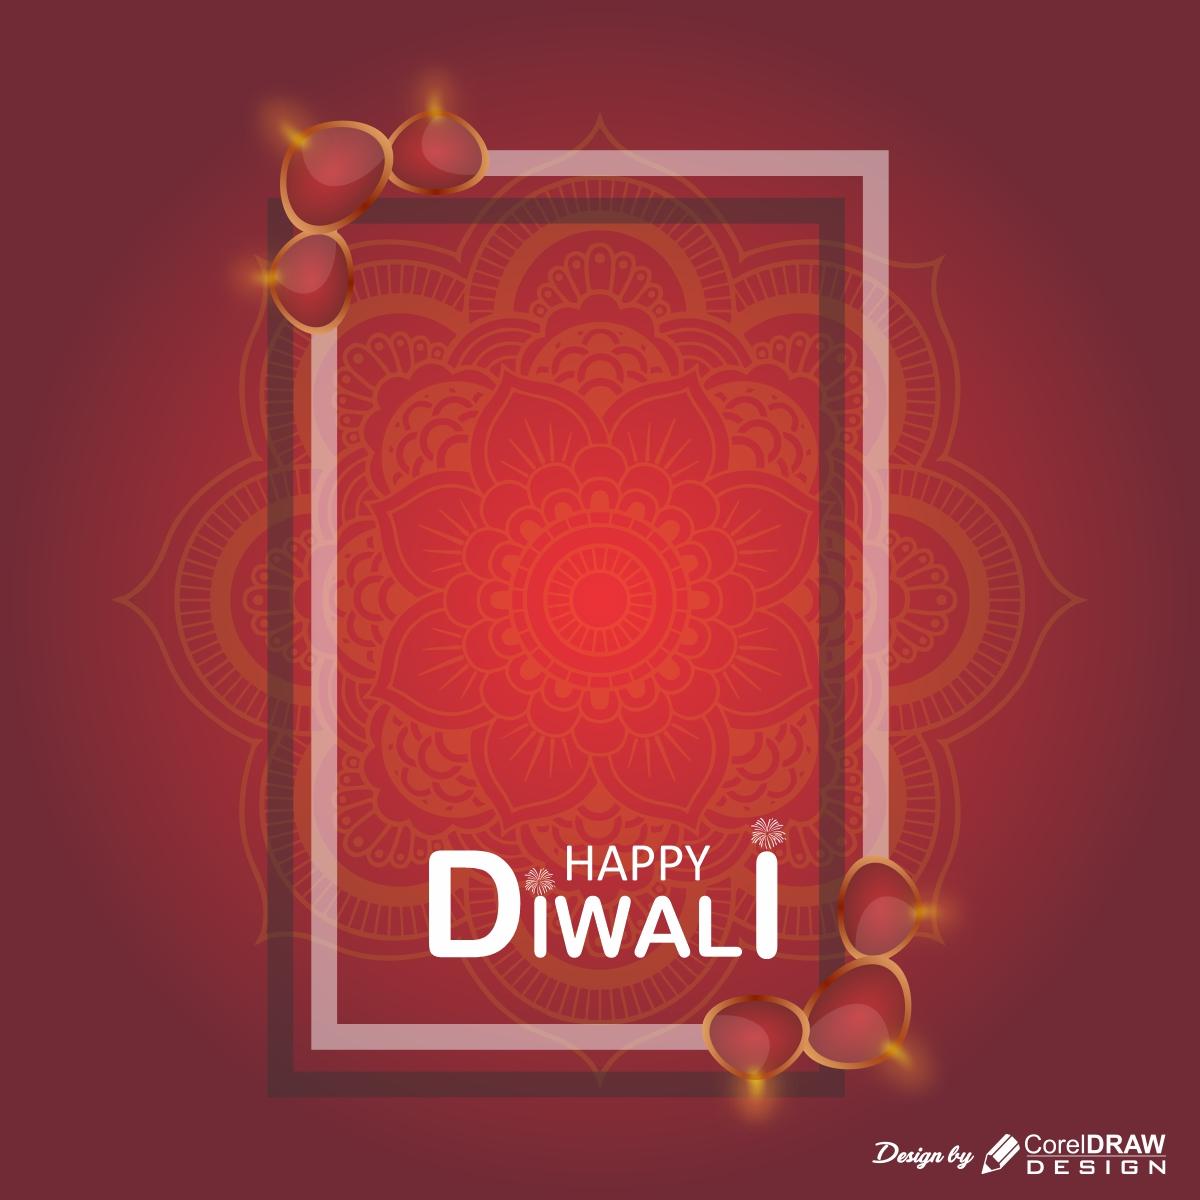 Download Happy Diwali Background With Mandala Coreldraw